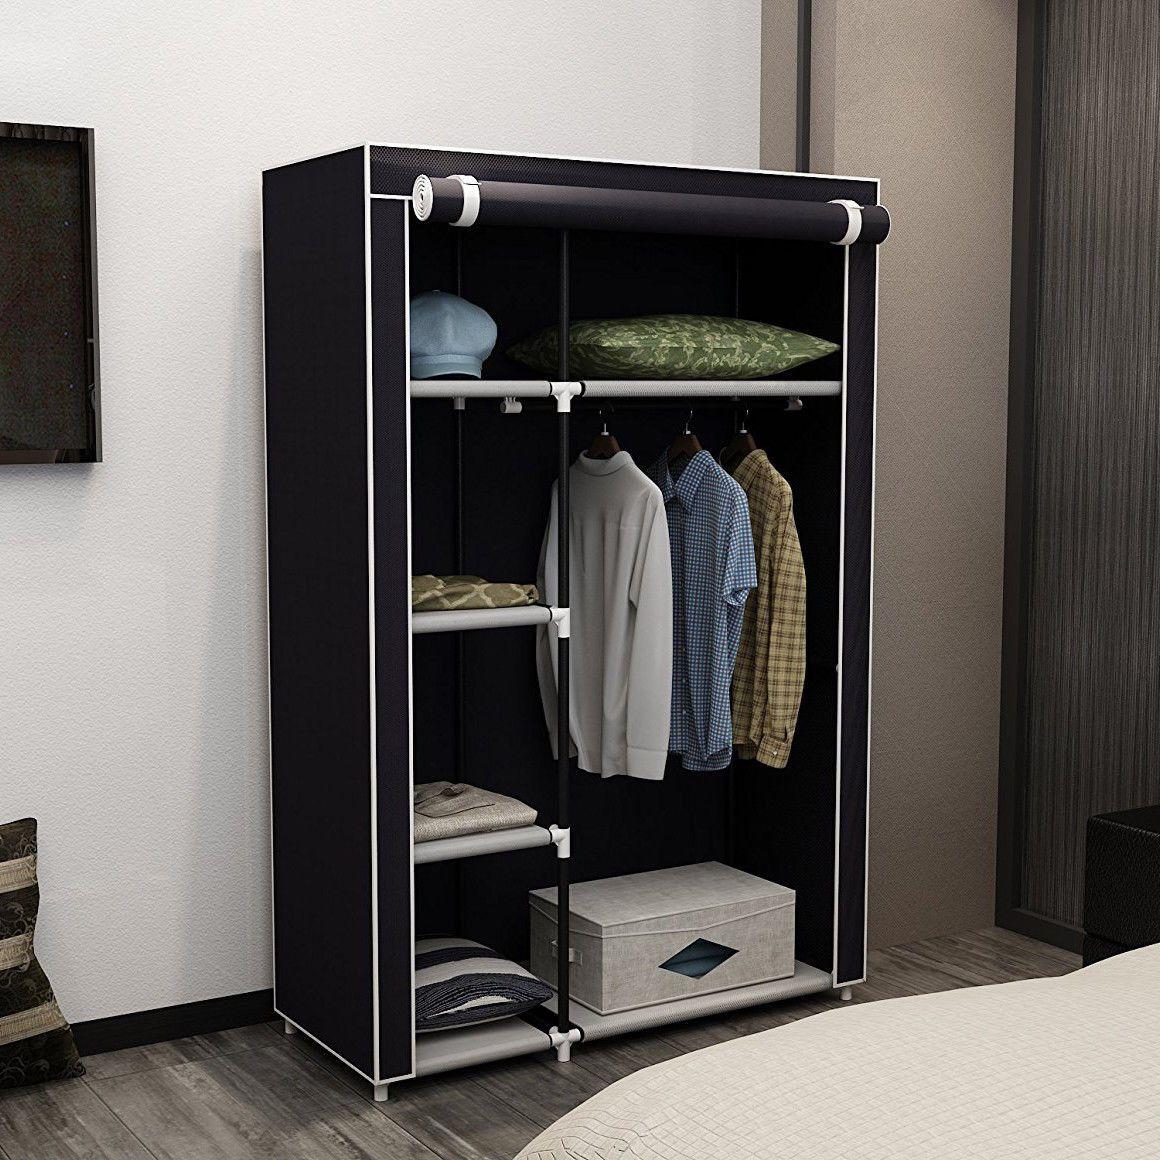 New 63 Portable Closet Storage Organizer Wardrobe Clothes Rack